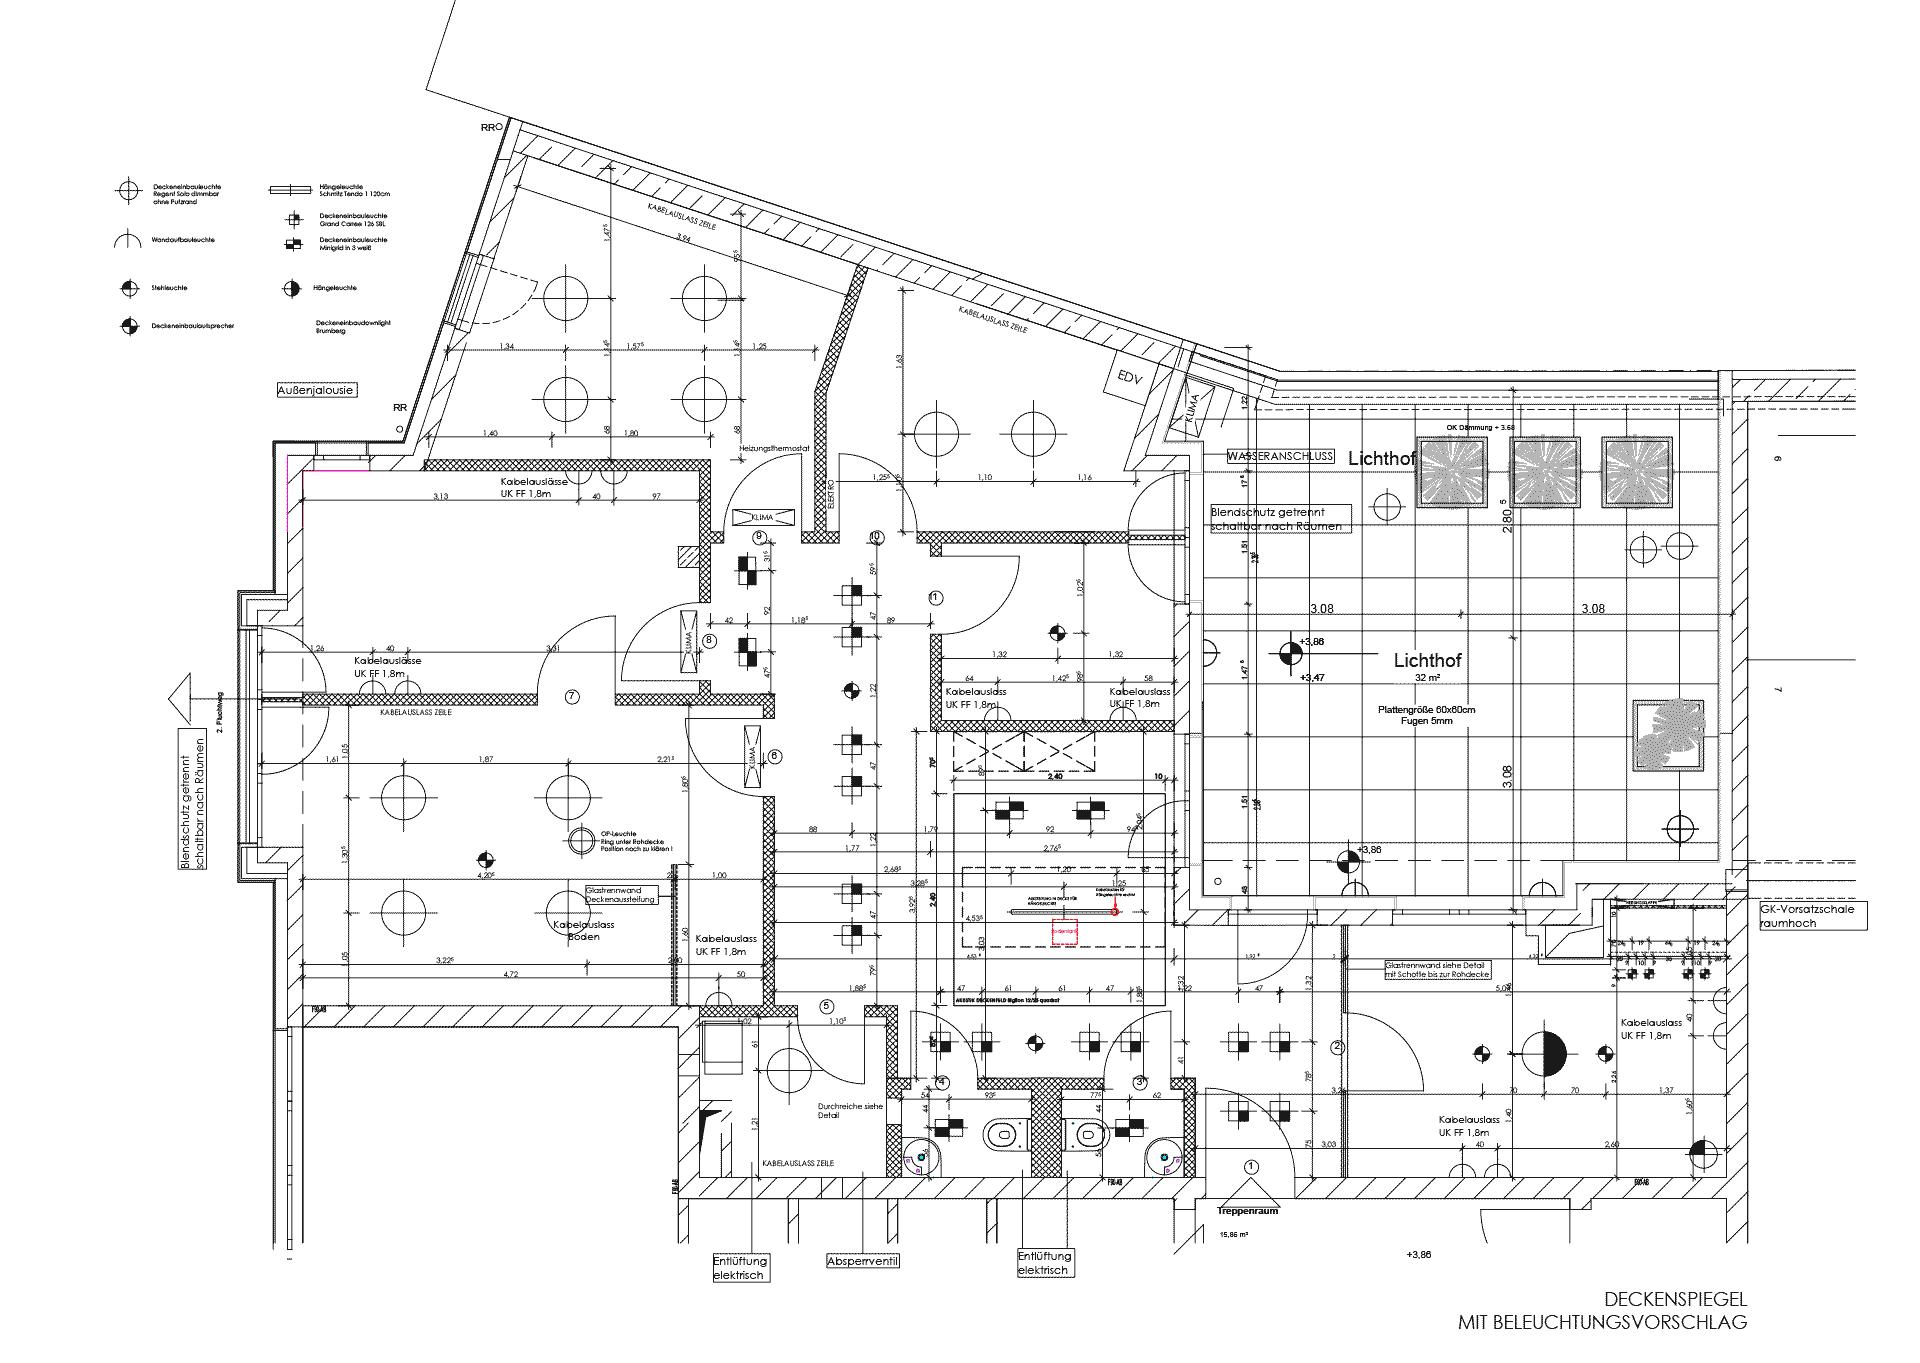 plankontur_innenarchitektur_CAD_Programme_Deckenspiegel_gross